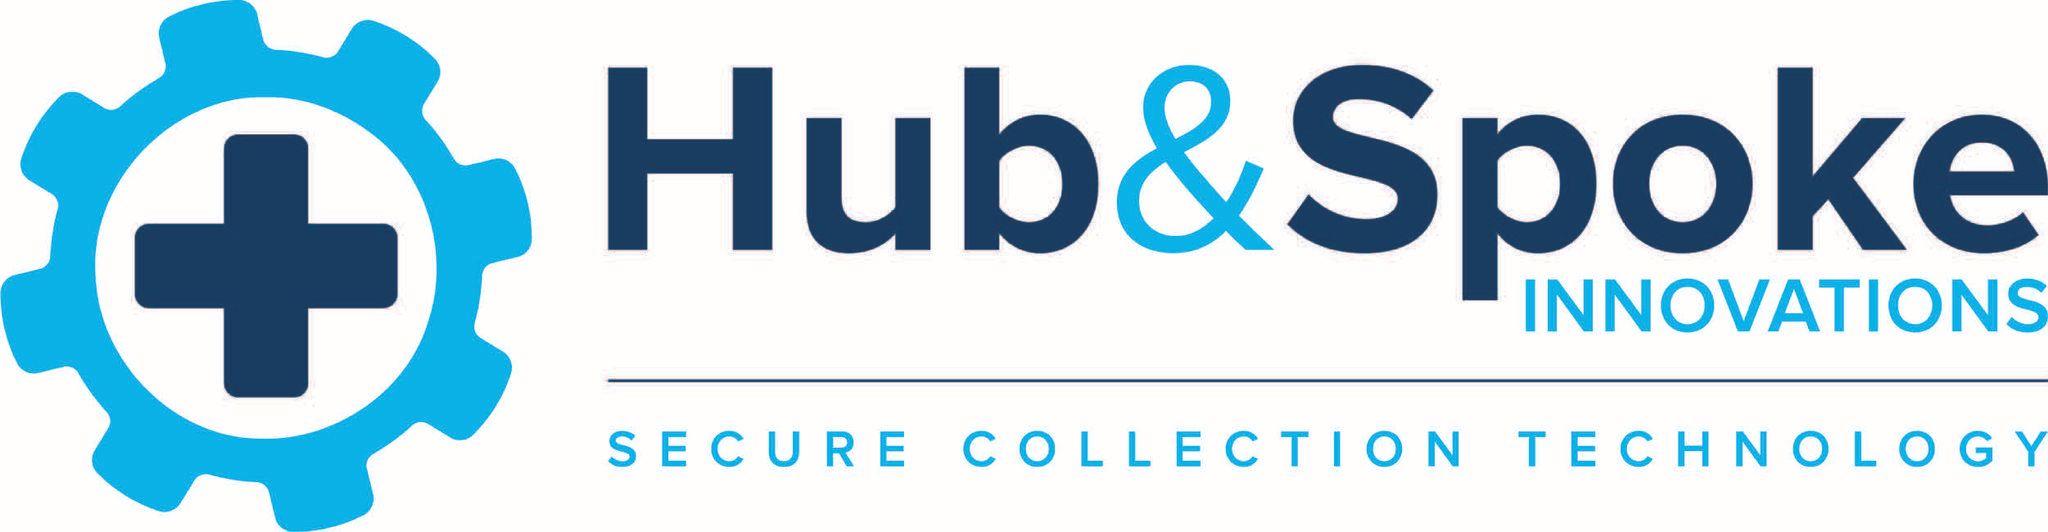 Hub and Spoke Innovations